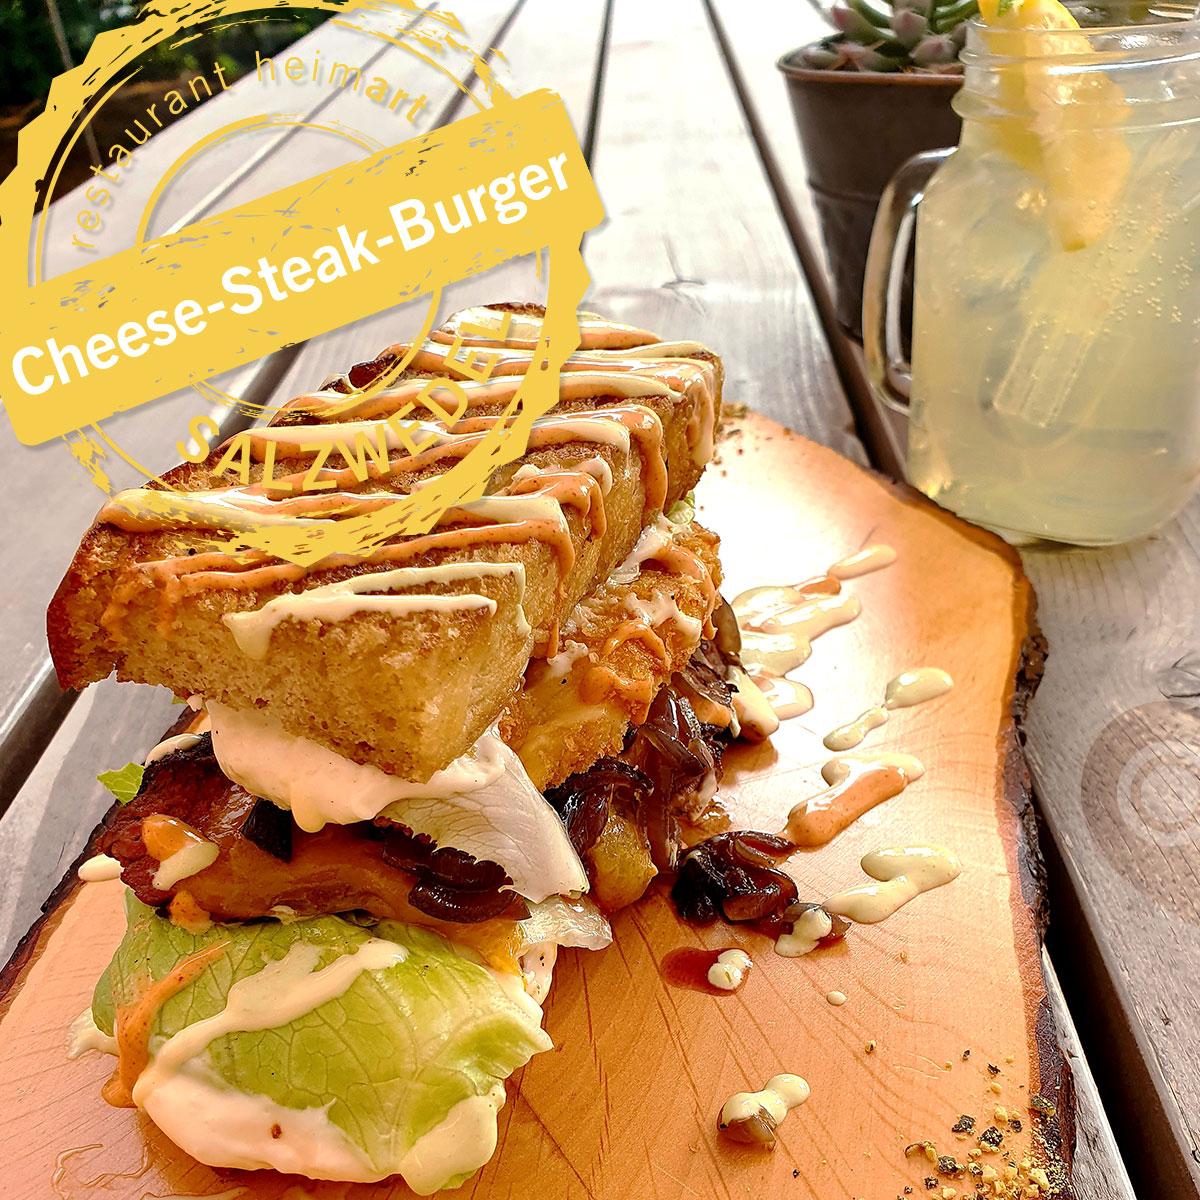 20200918_Cheese-Steak-Burger